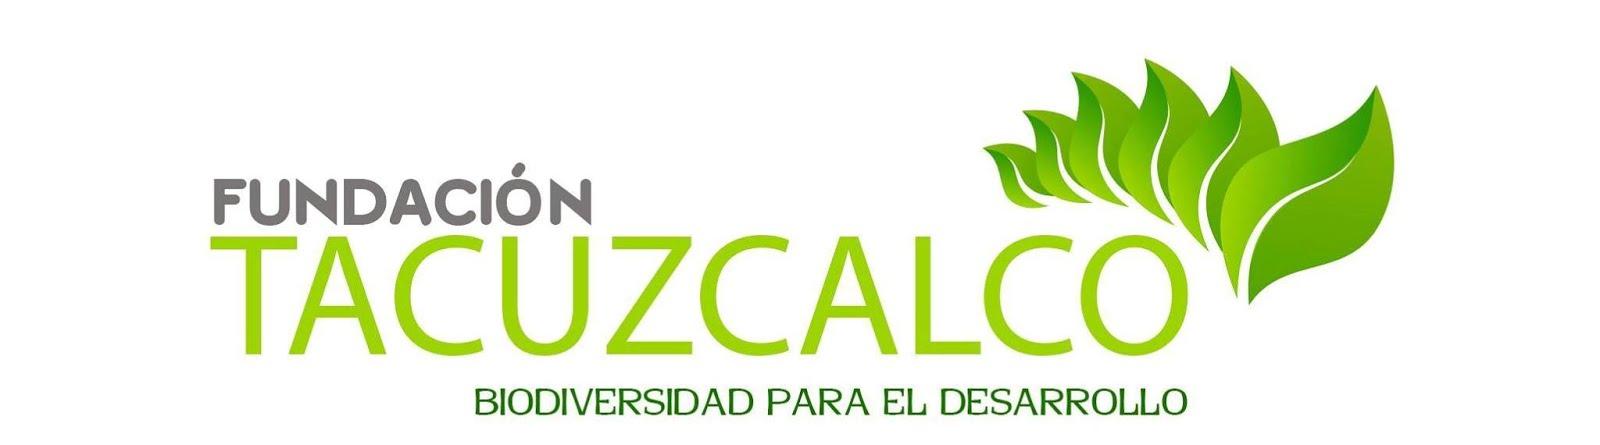 FUNDACION TACUZCALCO